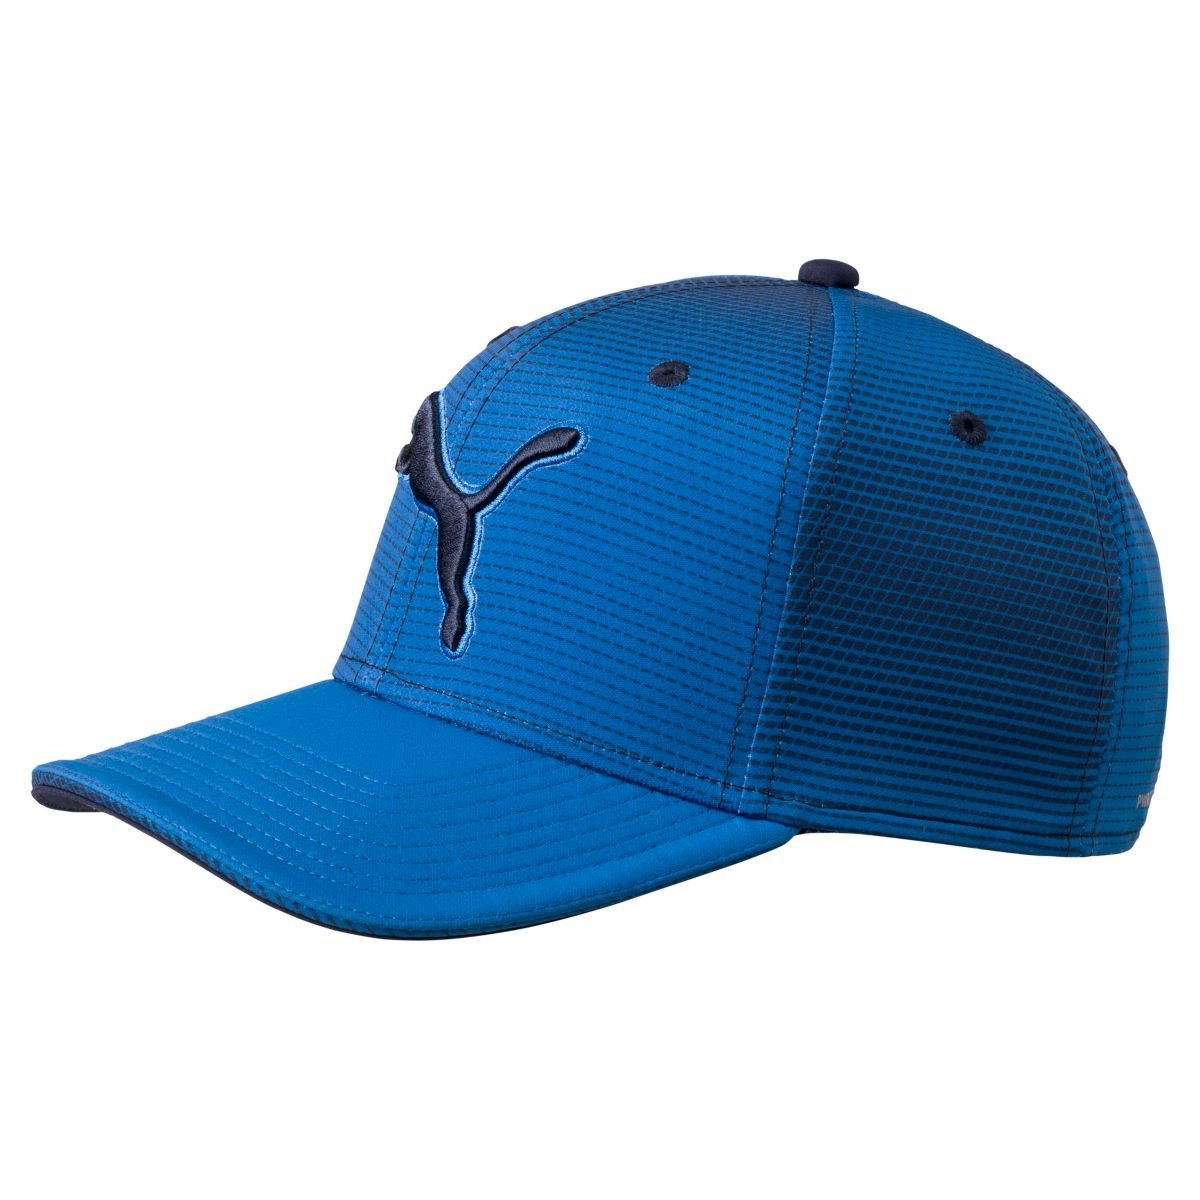 PUMA YOUTH  GOTIME HAT JUNIOR GOLF CAP 053193 -NEW 2017- PICK A SIZE -  Walmart.com 664c4ebe742